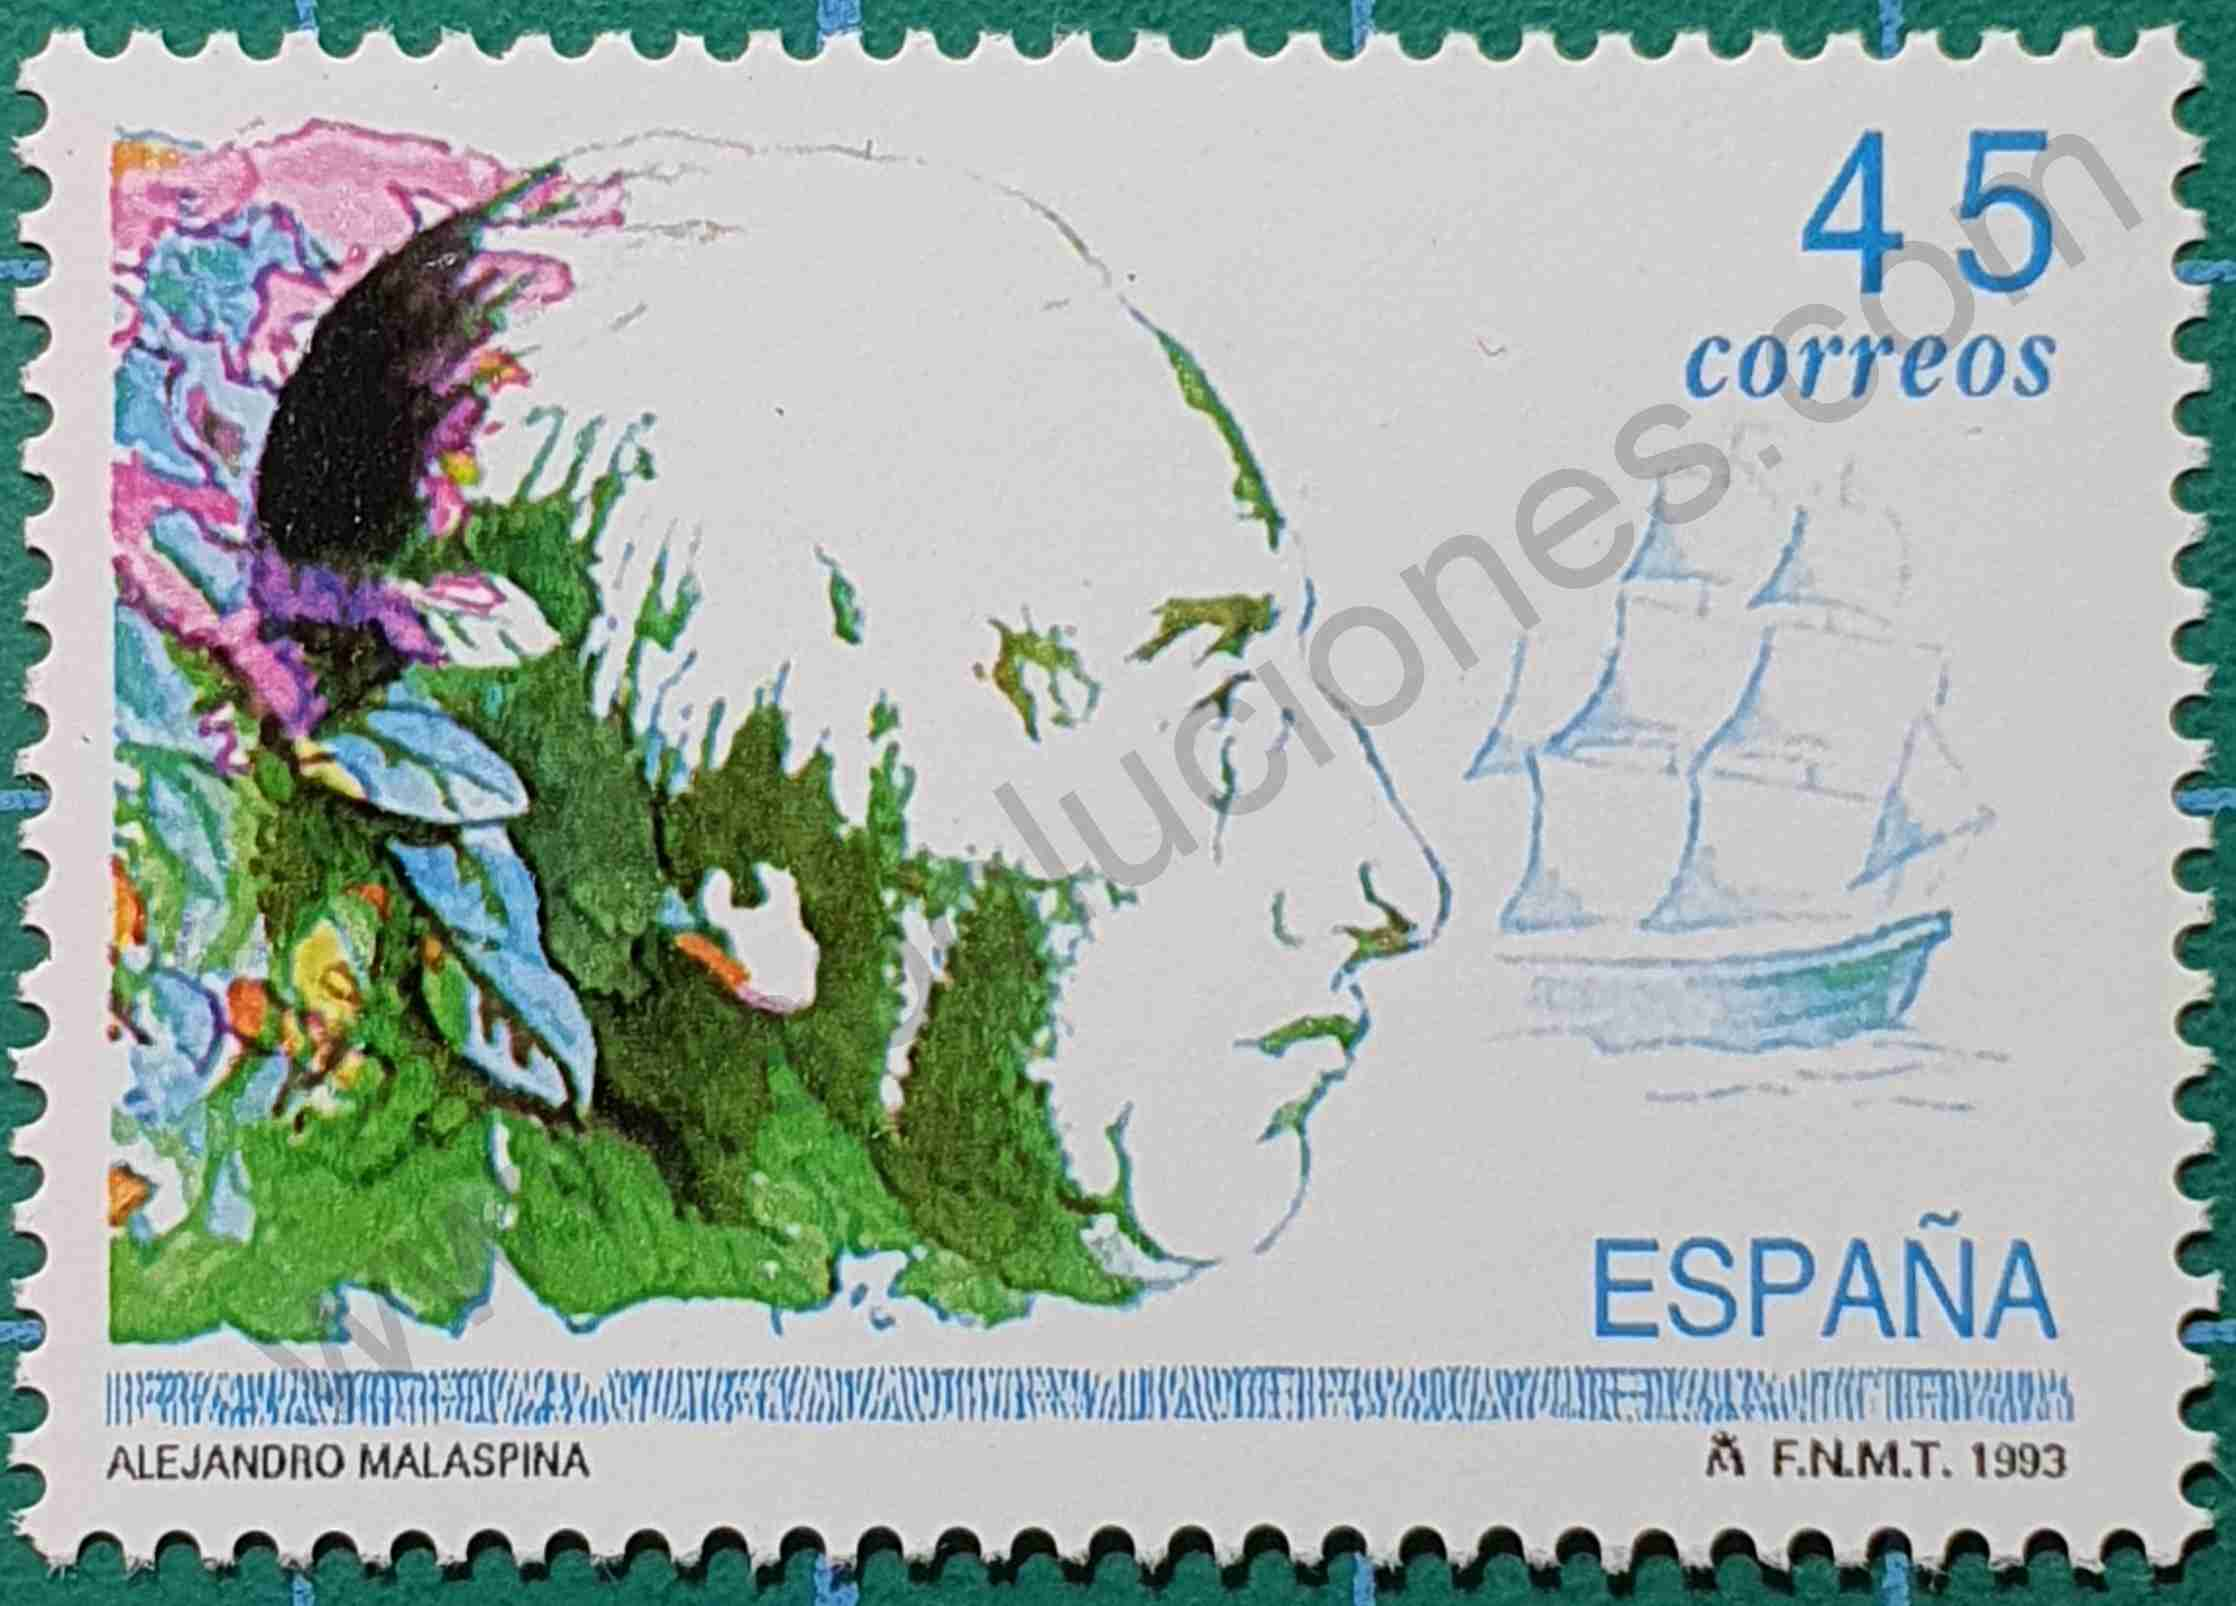 Alejandro Malaspina - sello España 1993